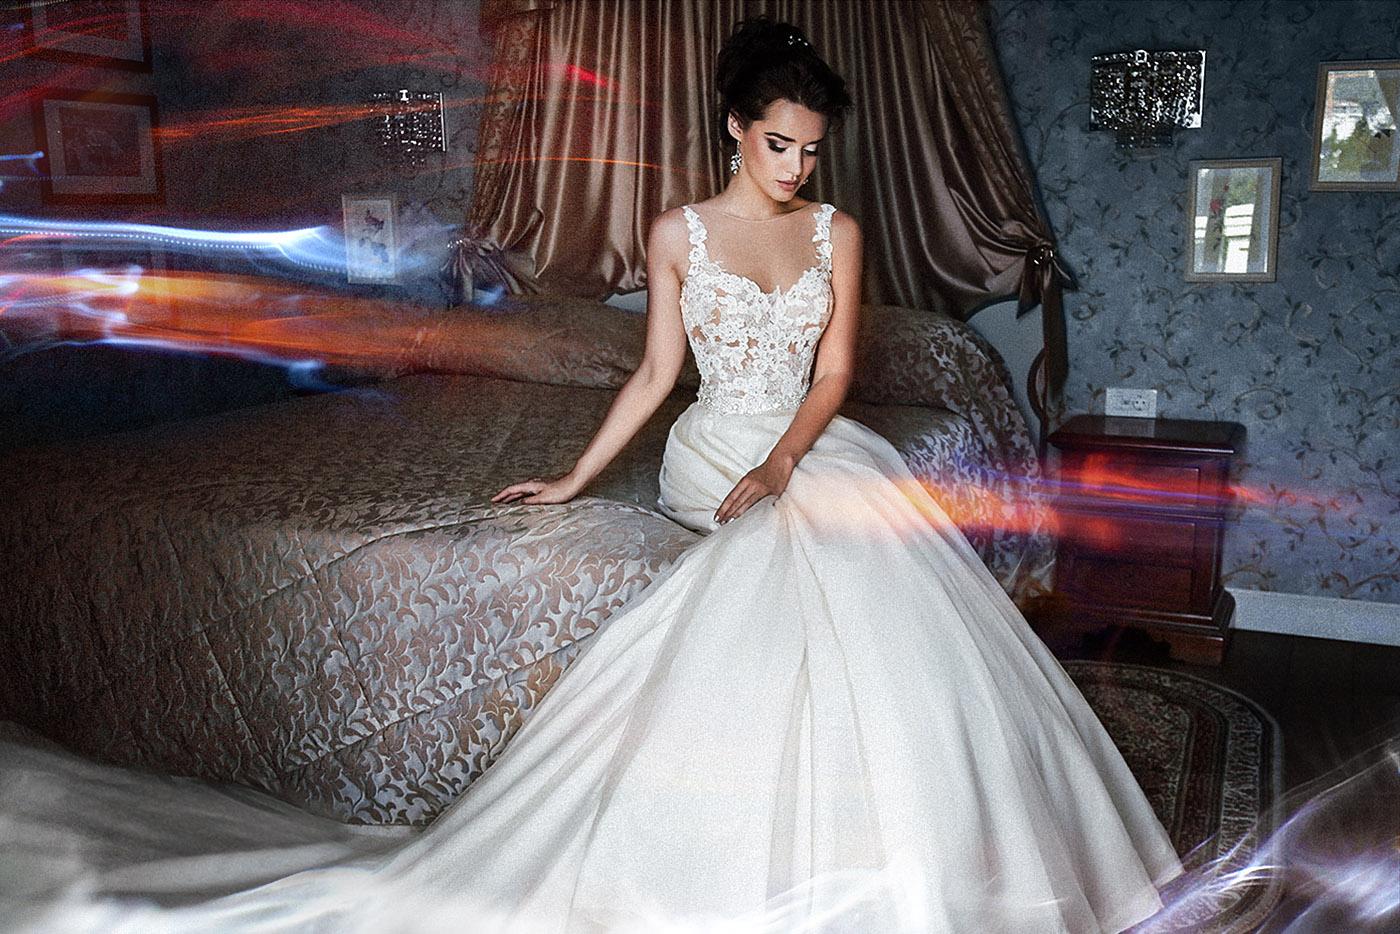 1200+ Wedding Bundle PS   LR items - 26 -